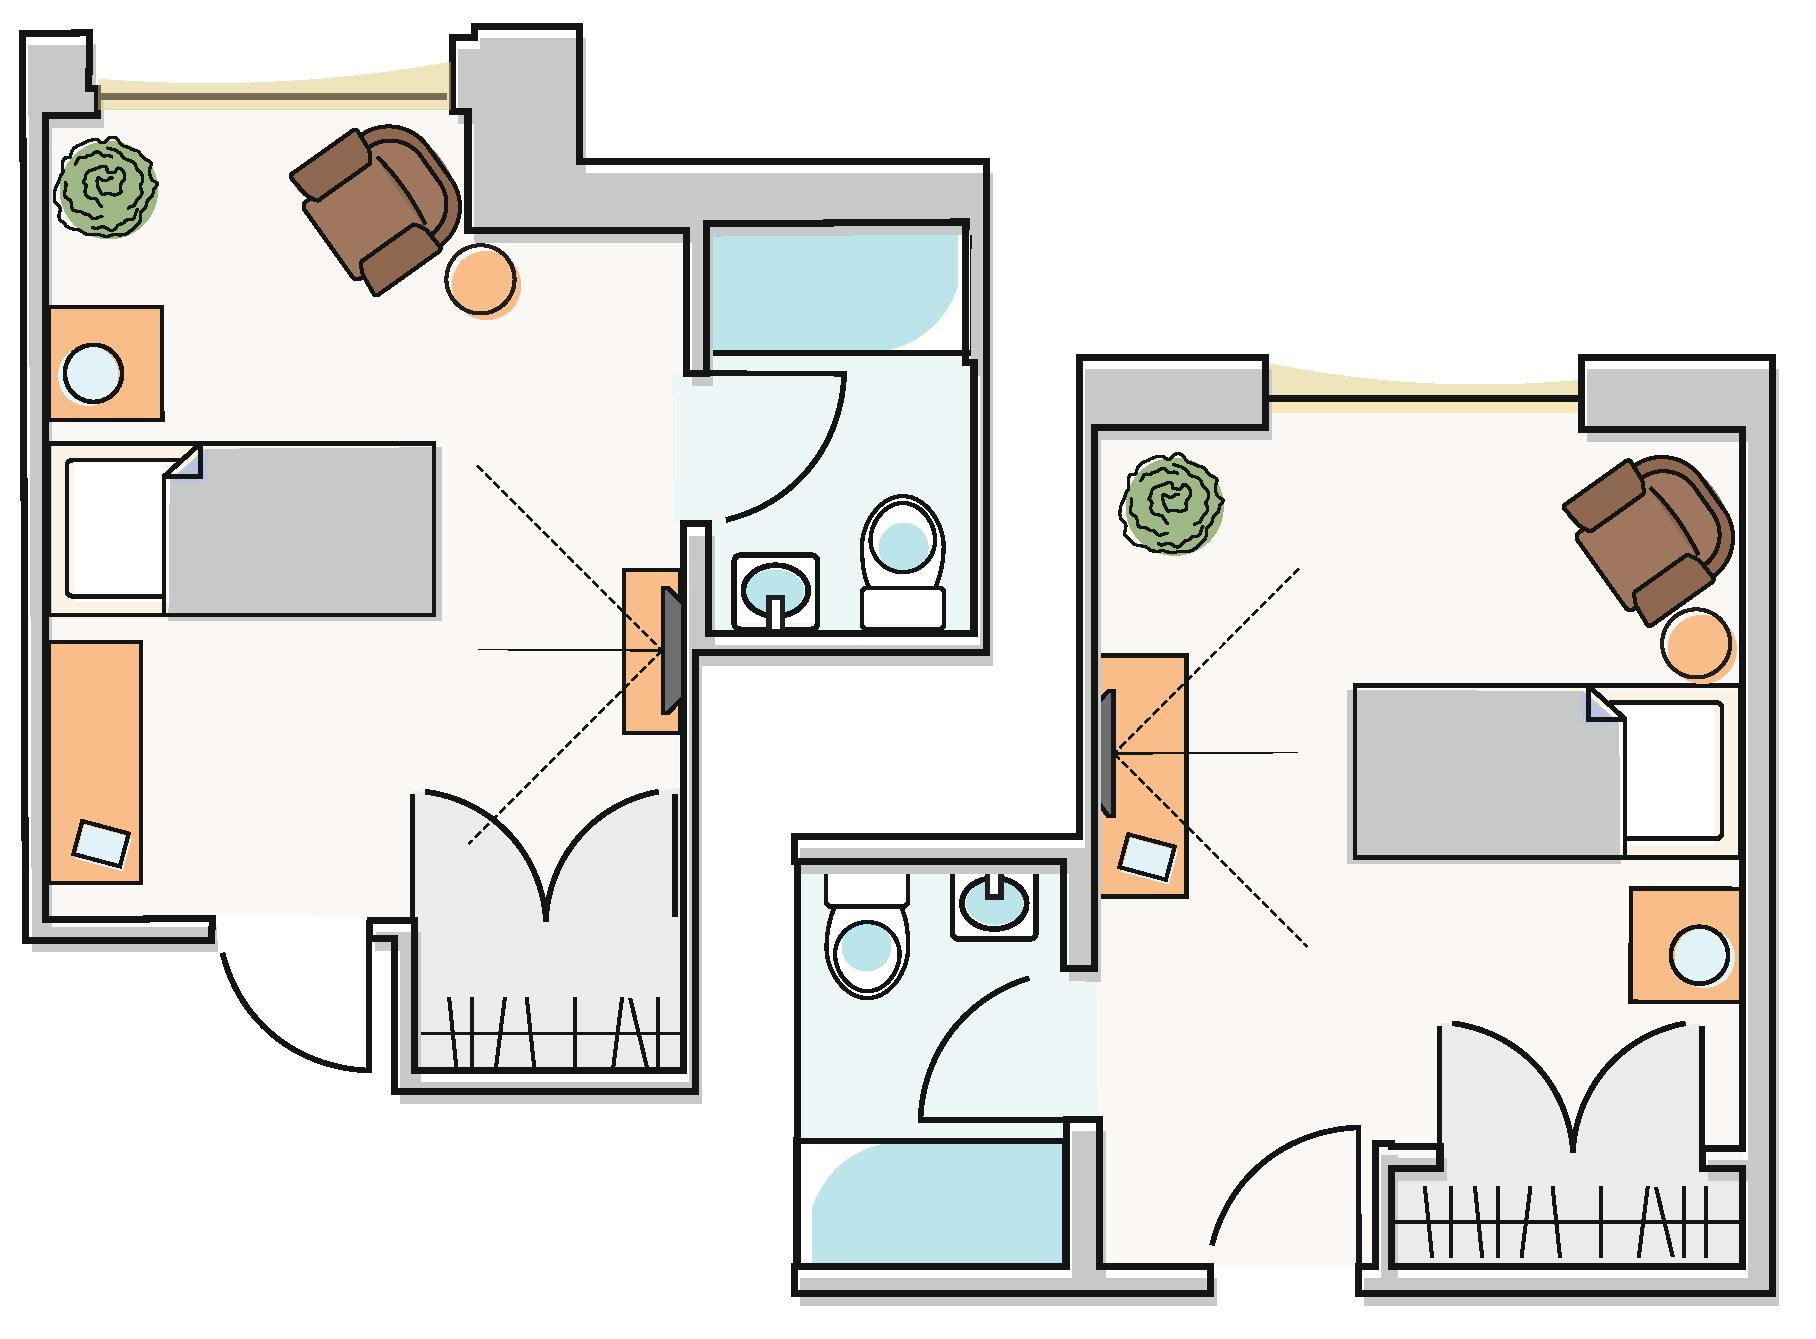 Bartholomew House Floor Plan